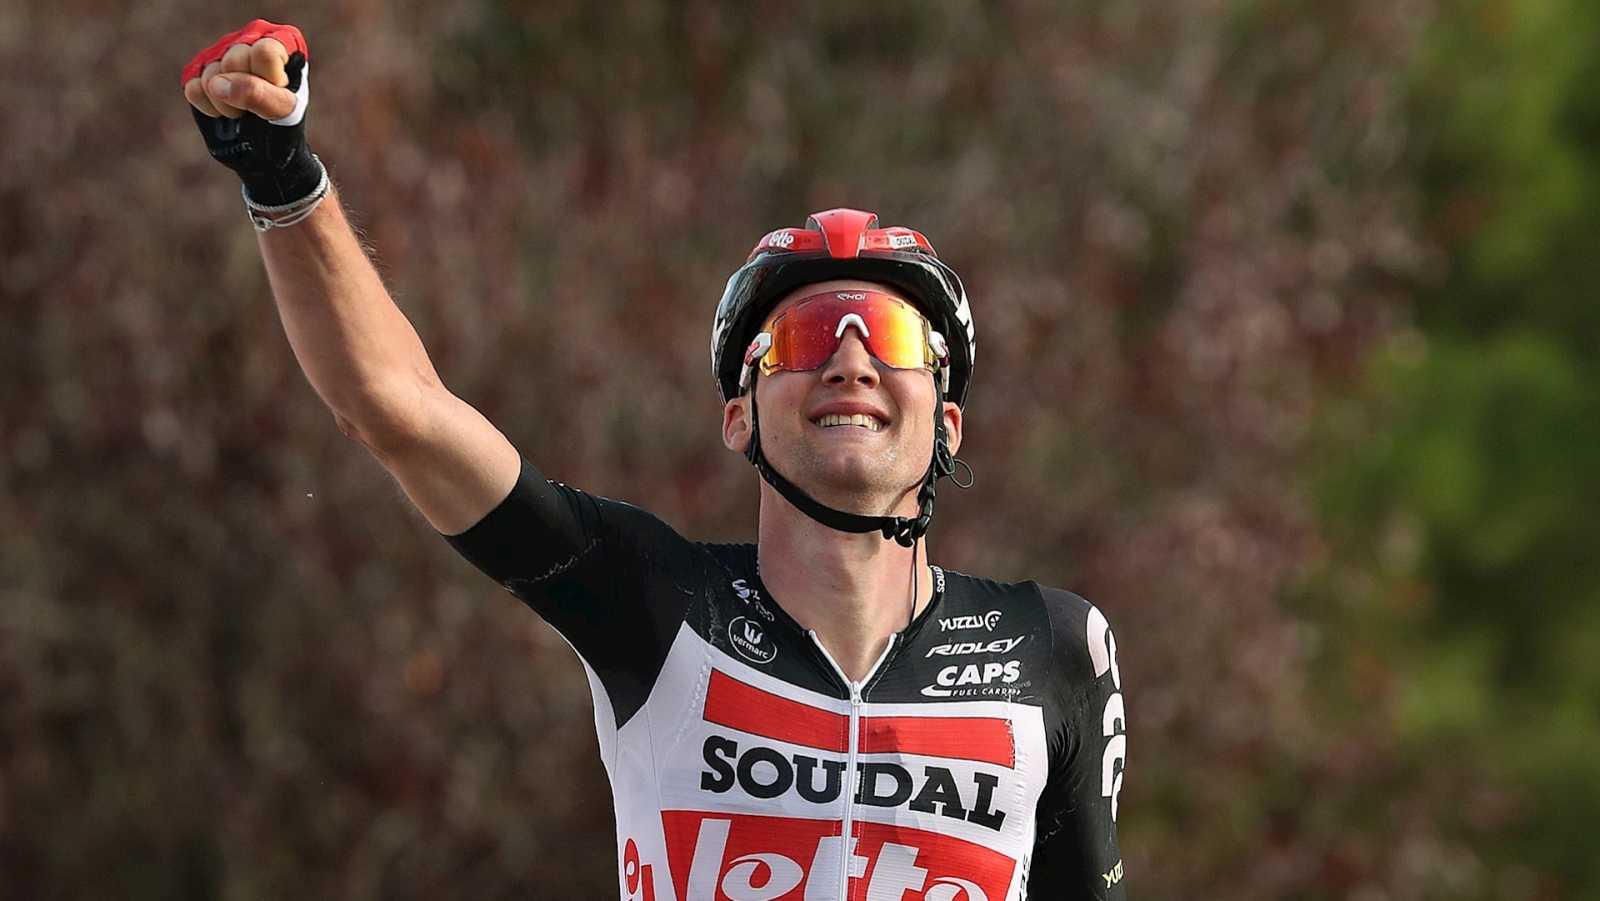 Tablero deportivo - Tim Wellens gana la 5ª etapa de La Vuelta - Escuchar ahora